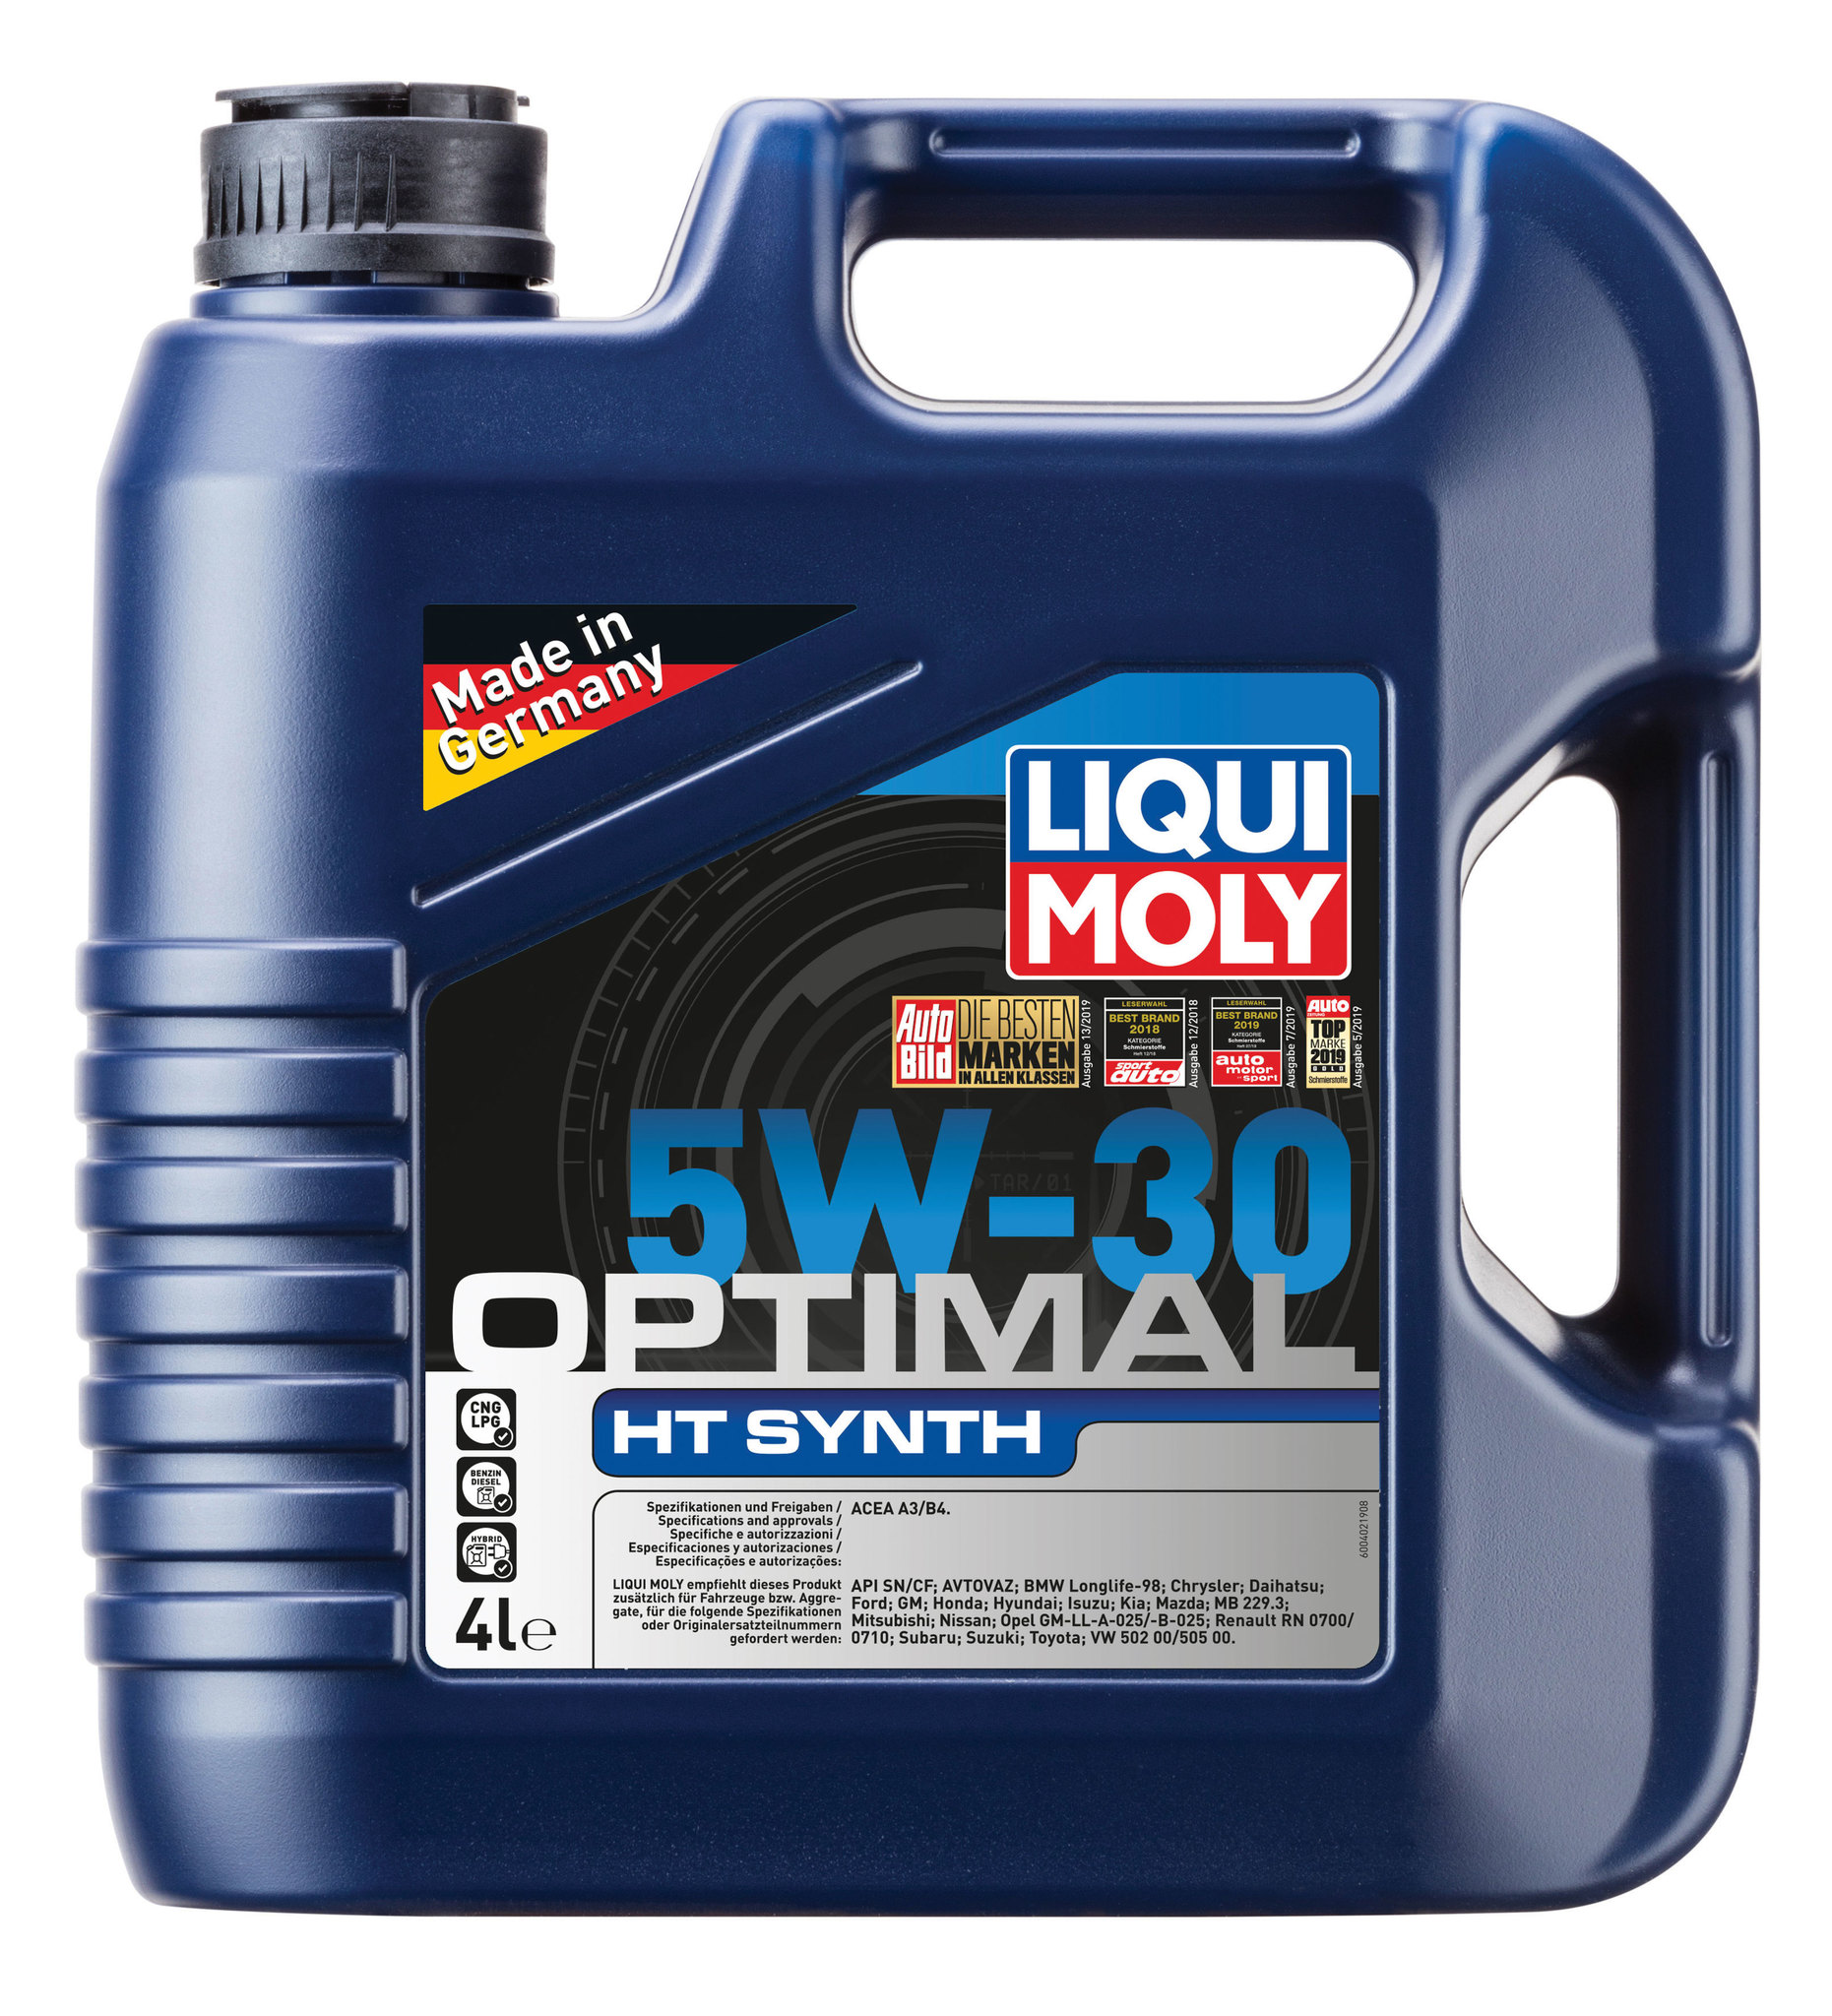 Liqui Moly Optimal HT Synth 5W30  НС синтетическое моторное масло